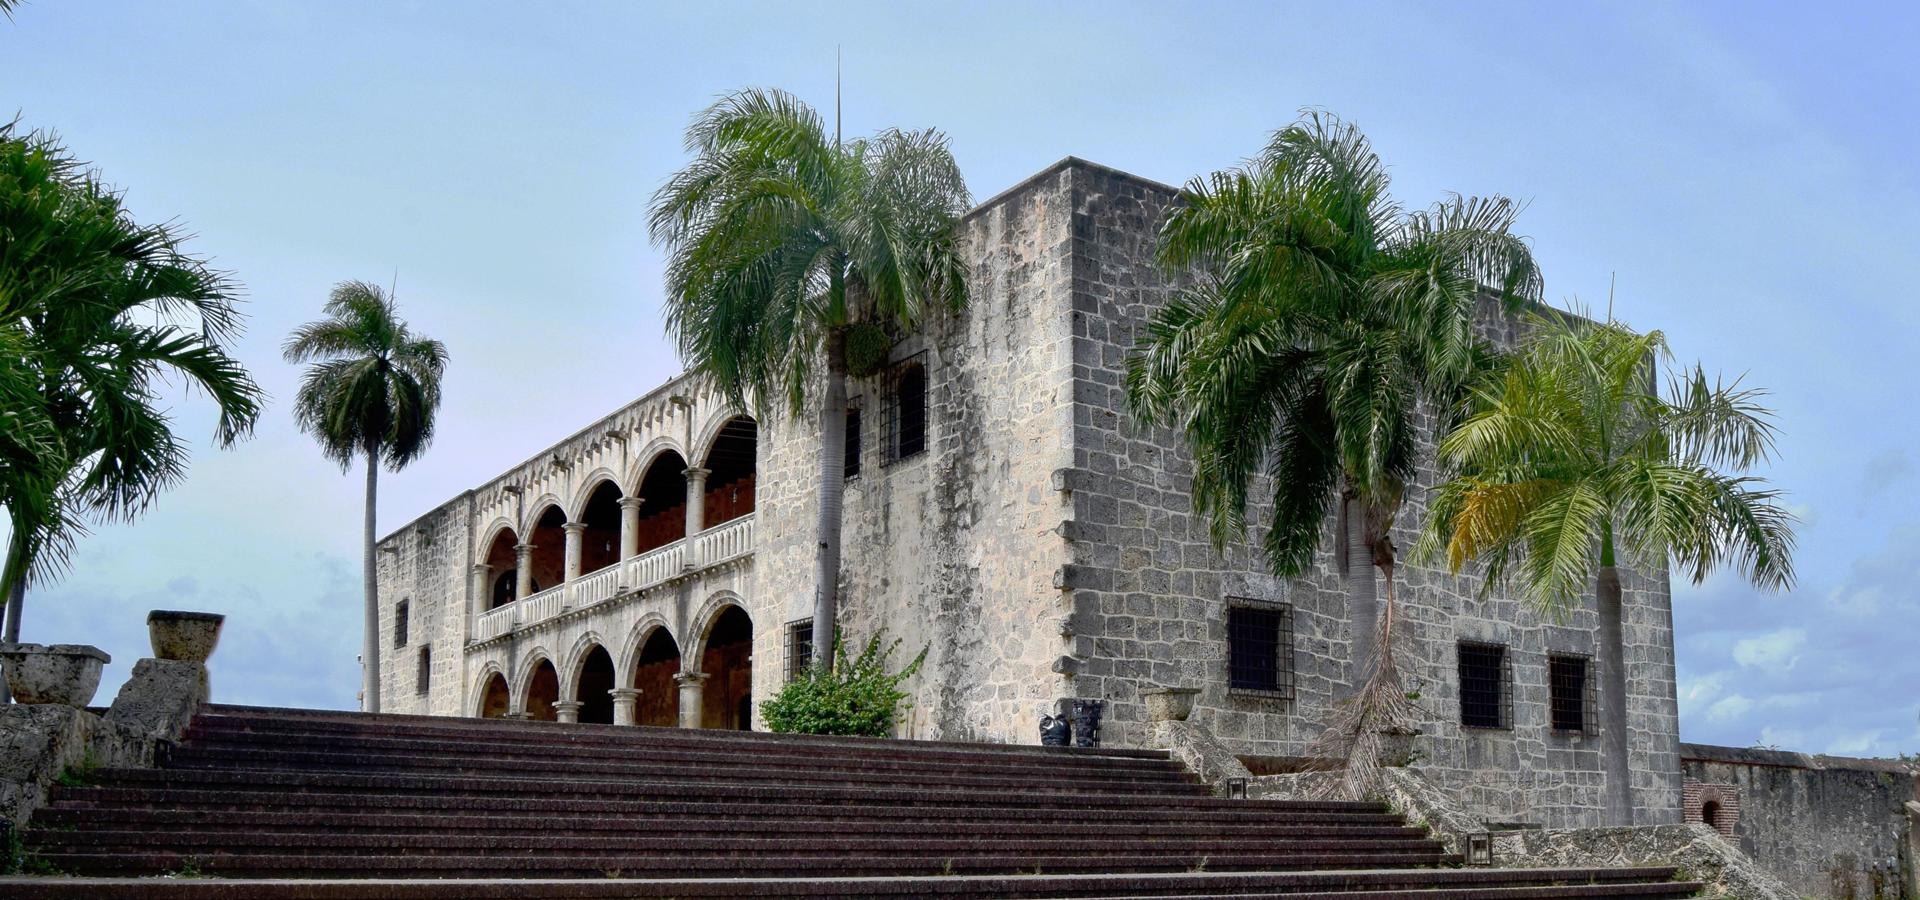 Peer-to-peer advisory in Santo Domingo, Distrito Nacional, The Dominican Republic